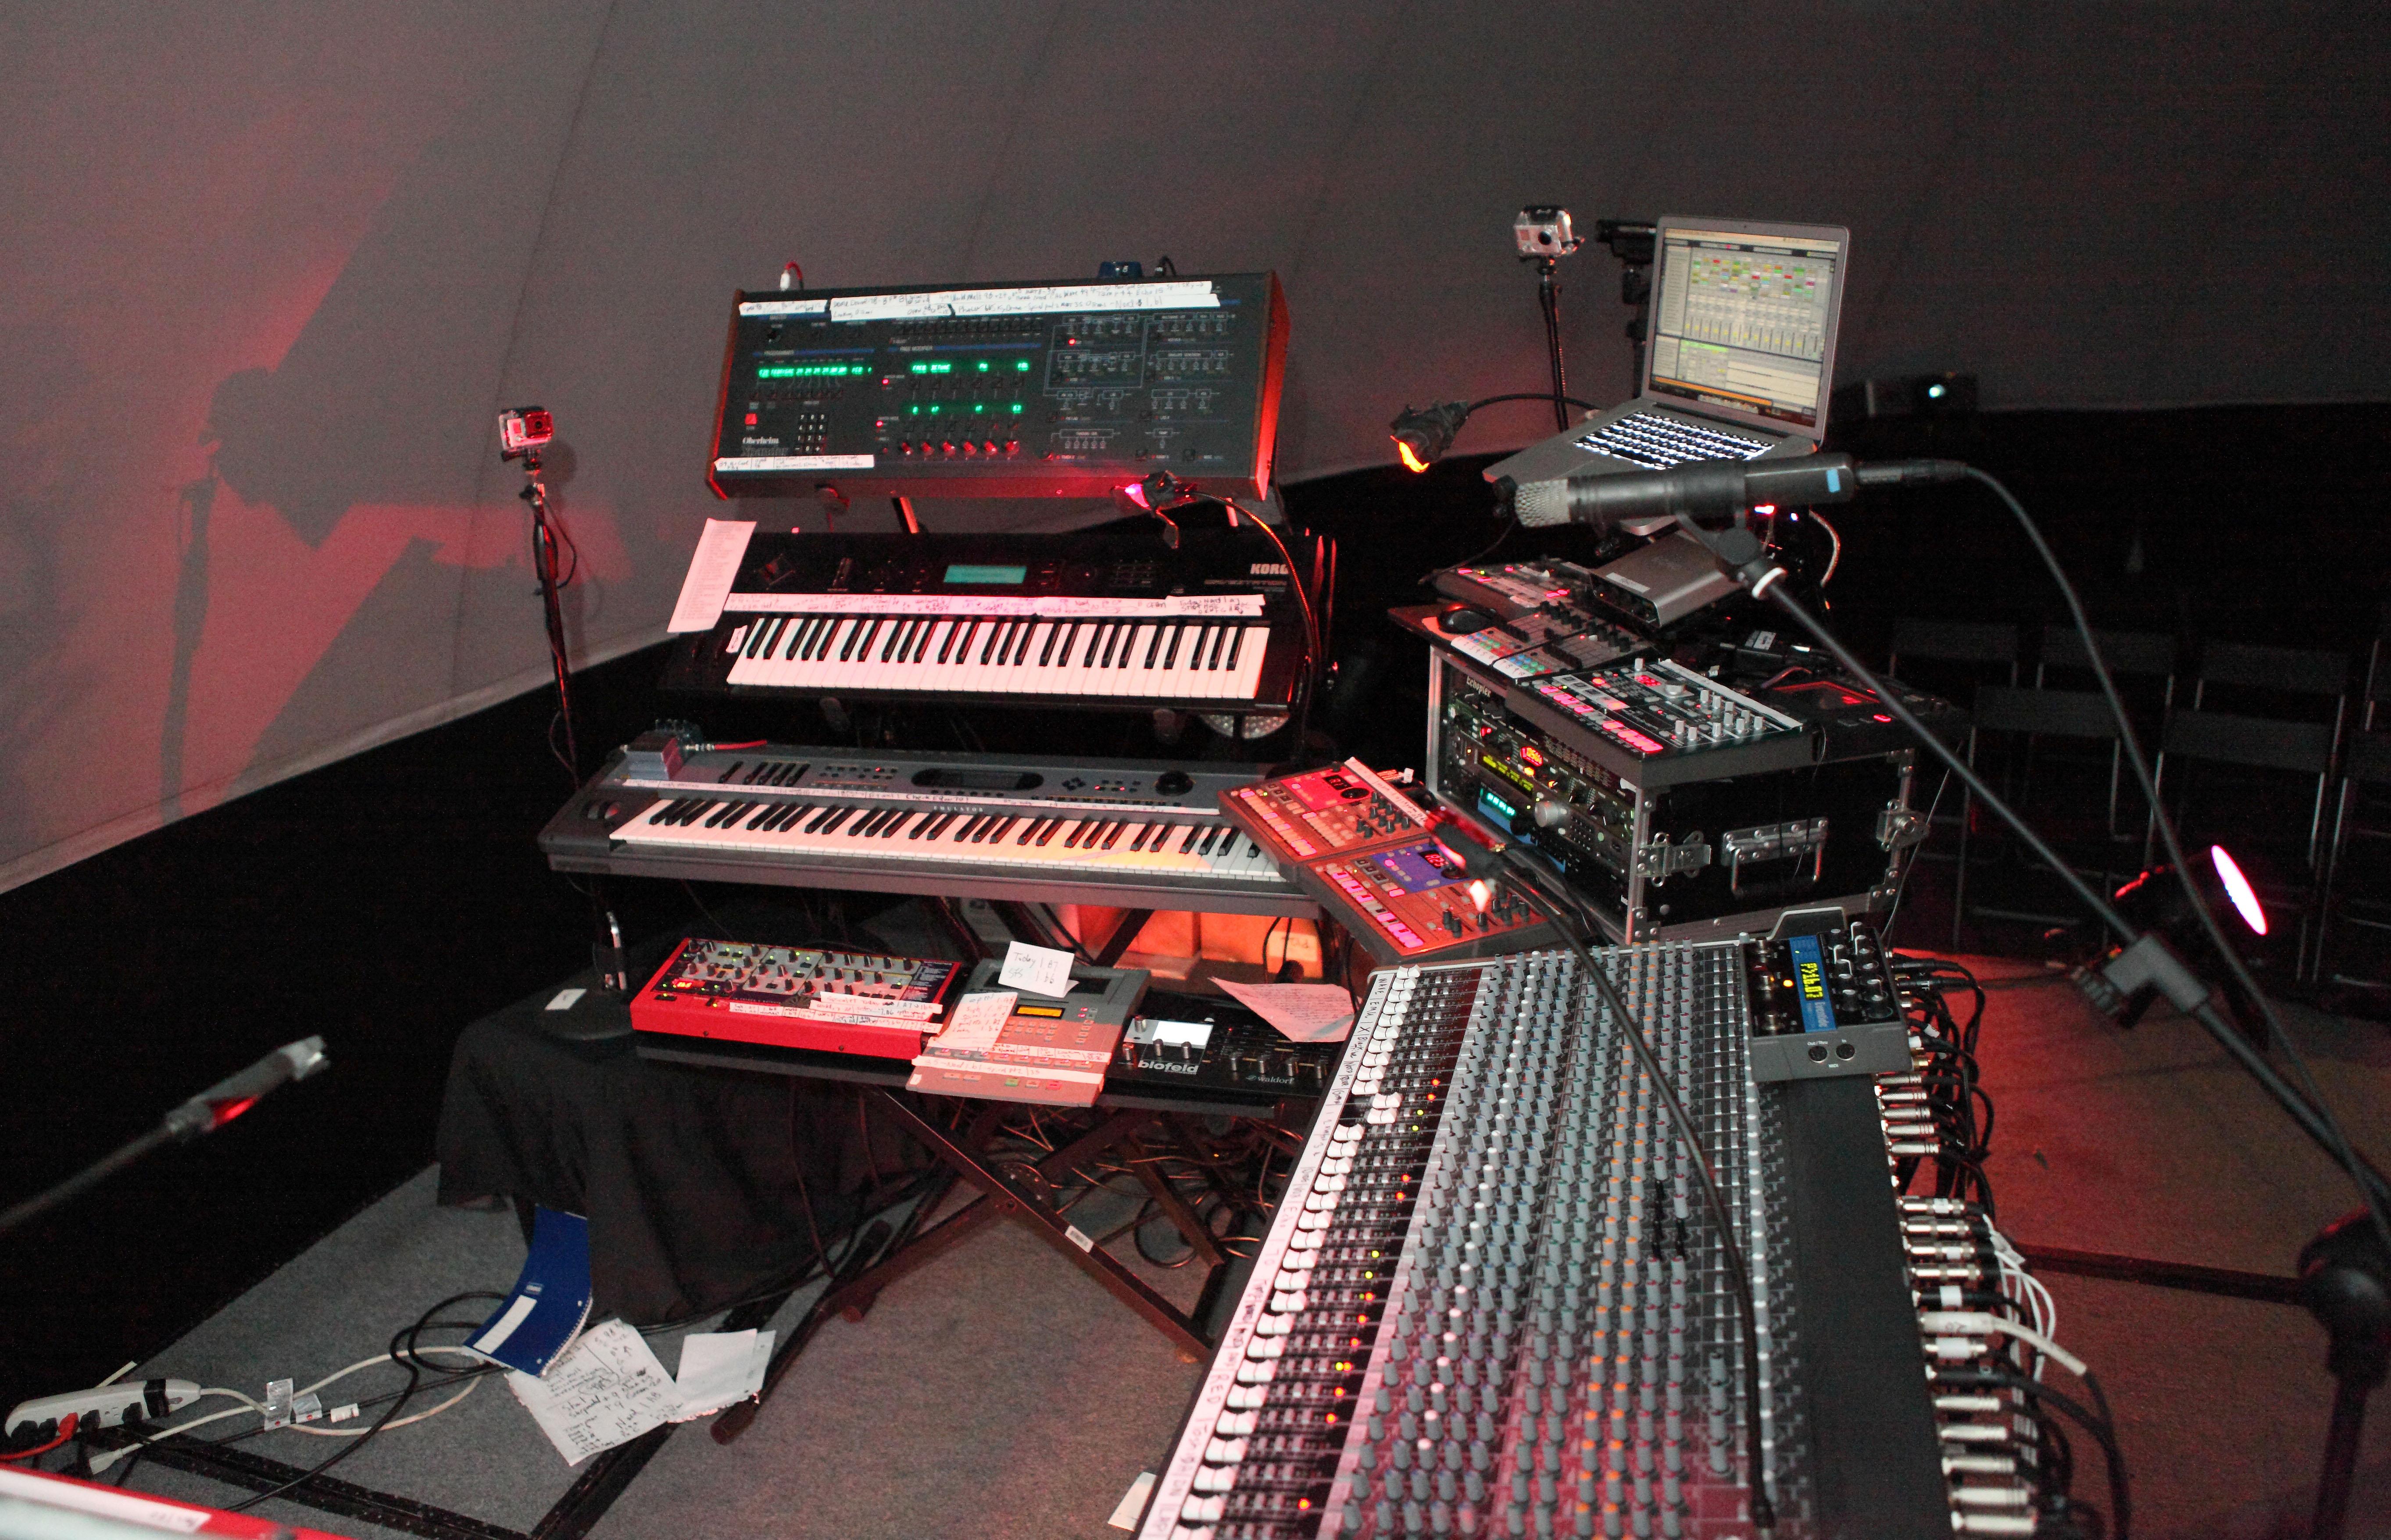 Steve Roach* Roach·, Richard Burmer* Burmer·, Kevin Braheny* Braheny - Western Spaces